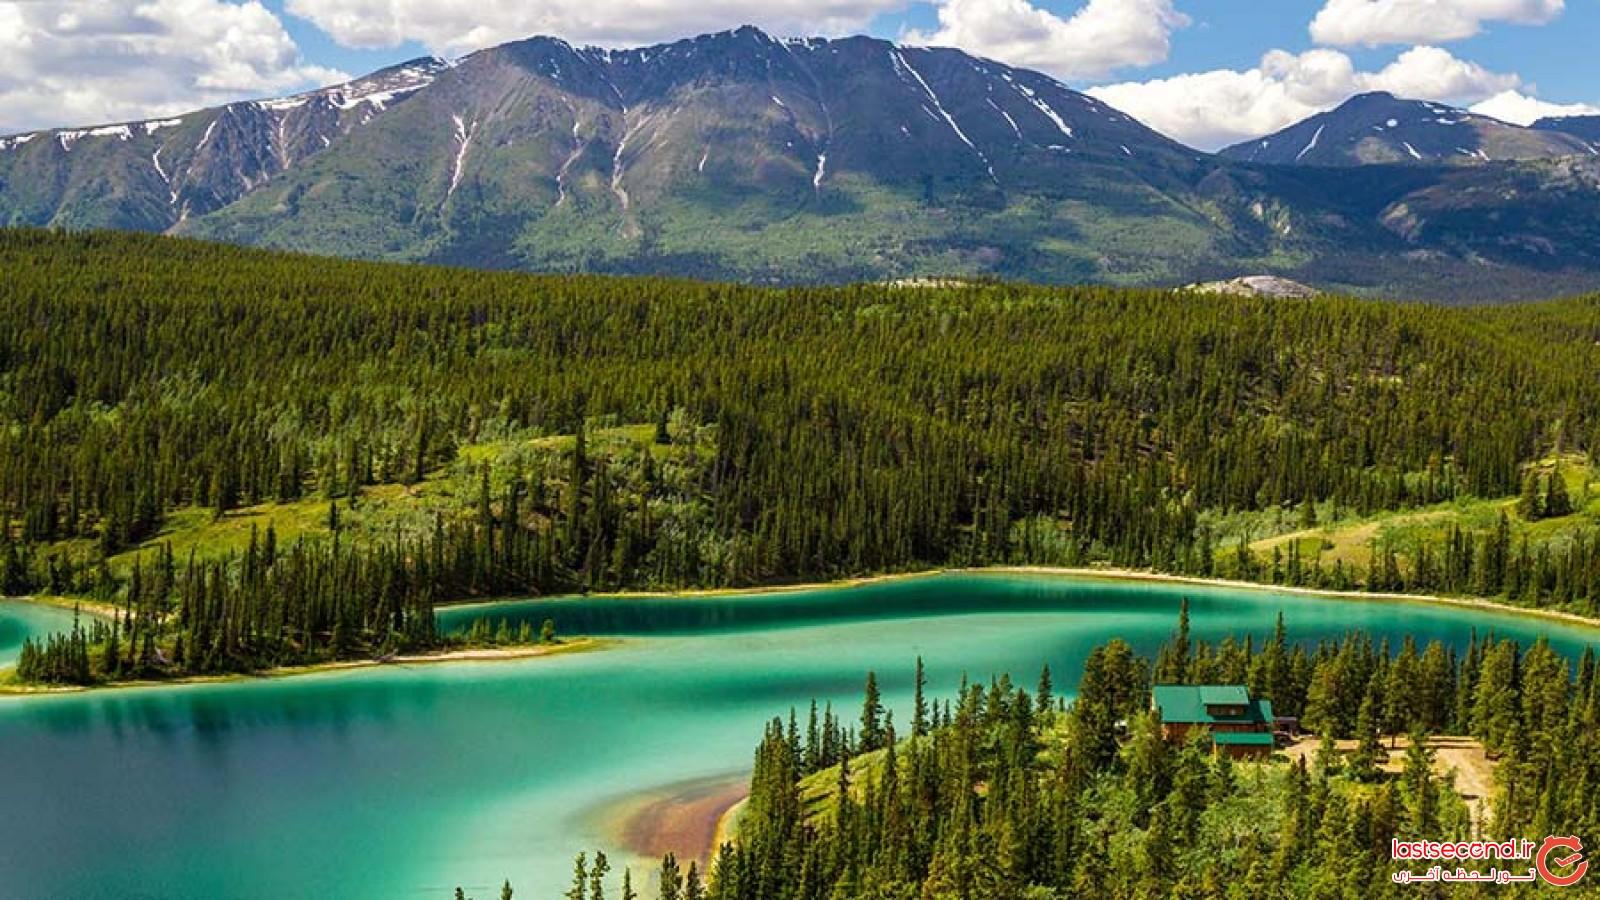 تله کابین سواری در سرزمین عجایب کانادا - Wonderland